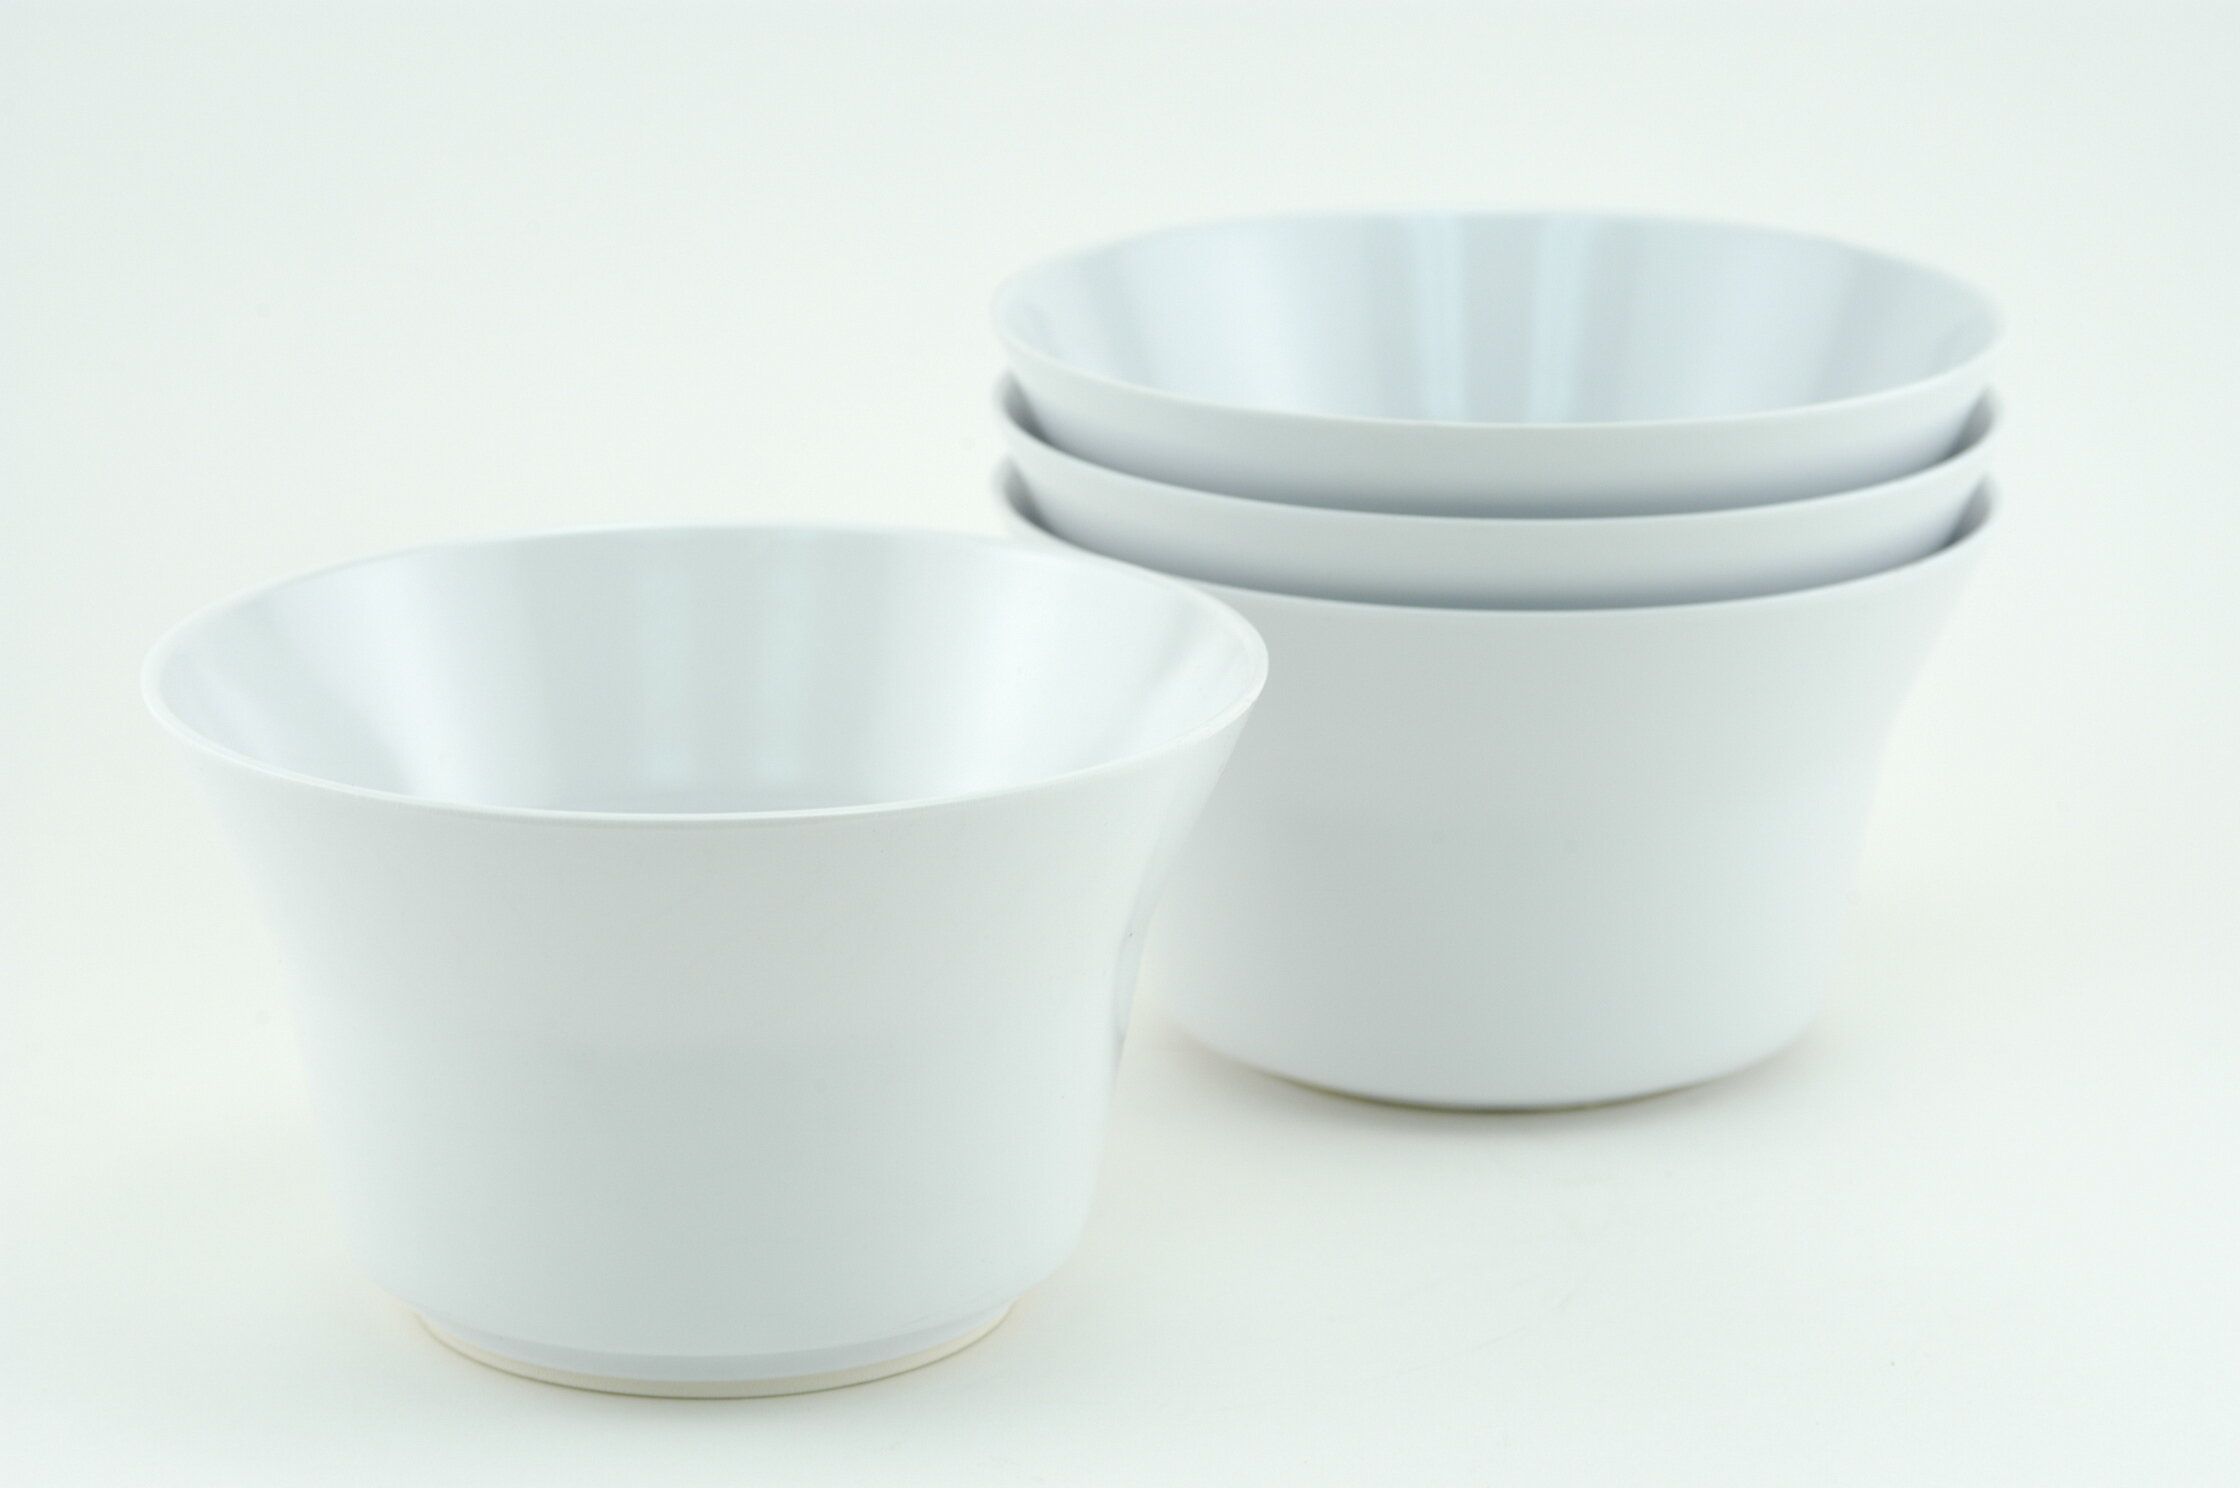 Galleywarecompany 16 Oz Soup Cereal Bowl Reviews